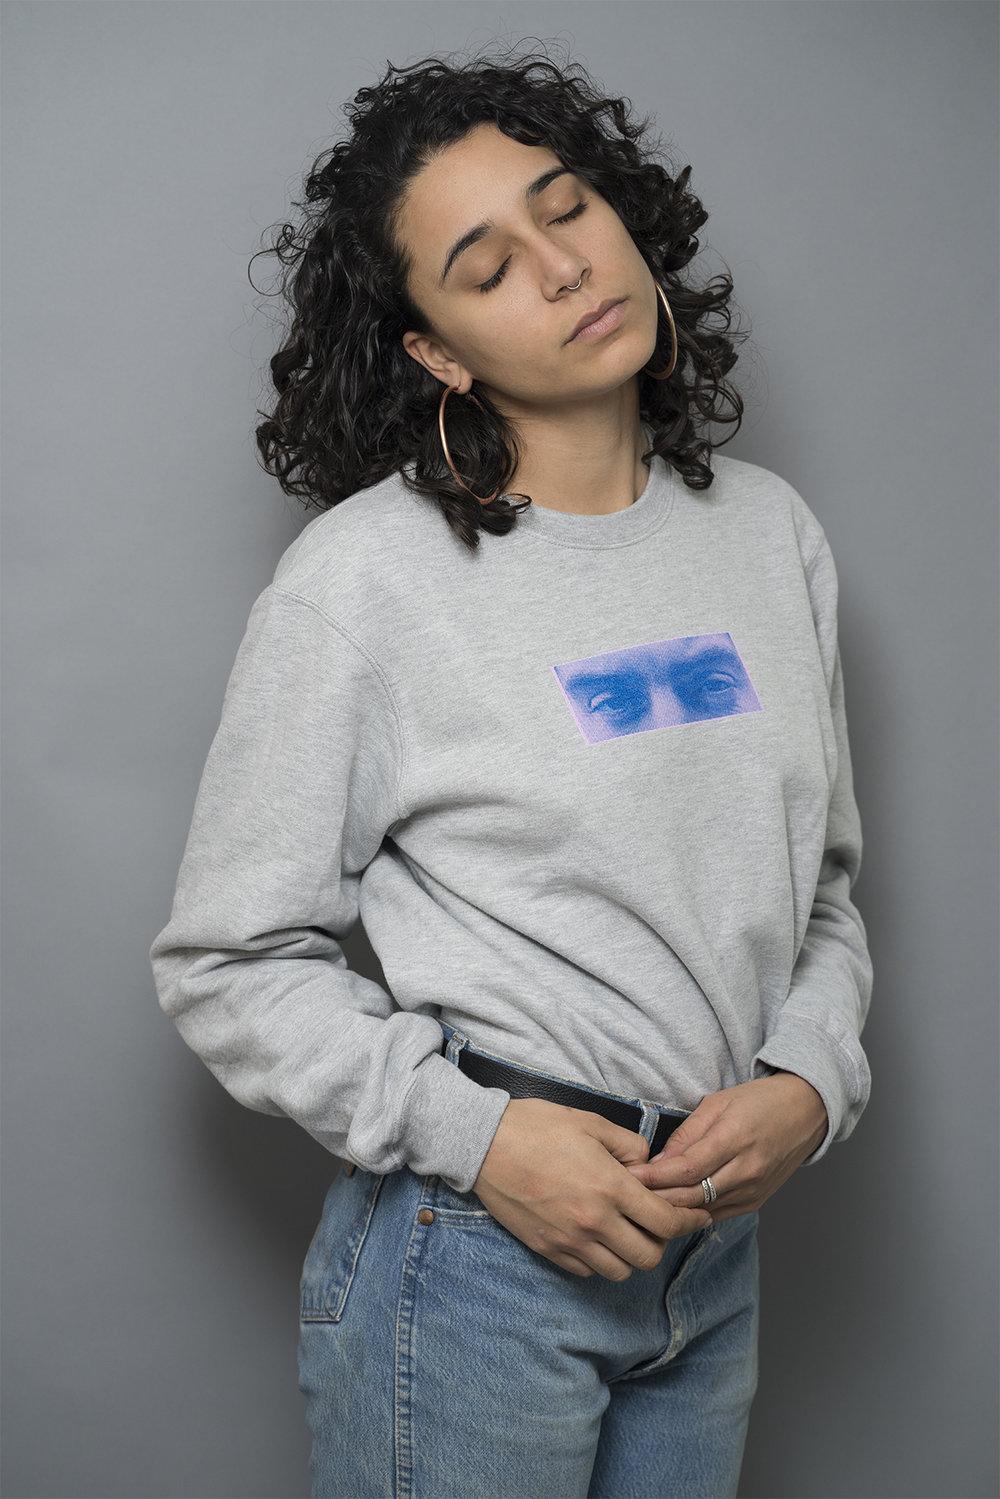 Model wearing Unisex Medium